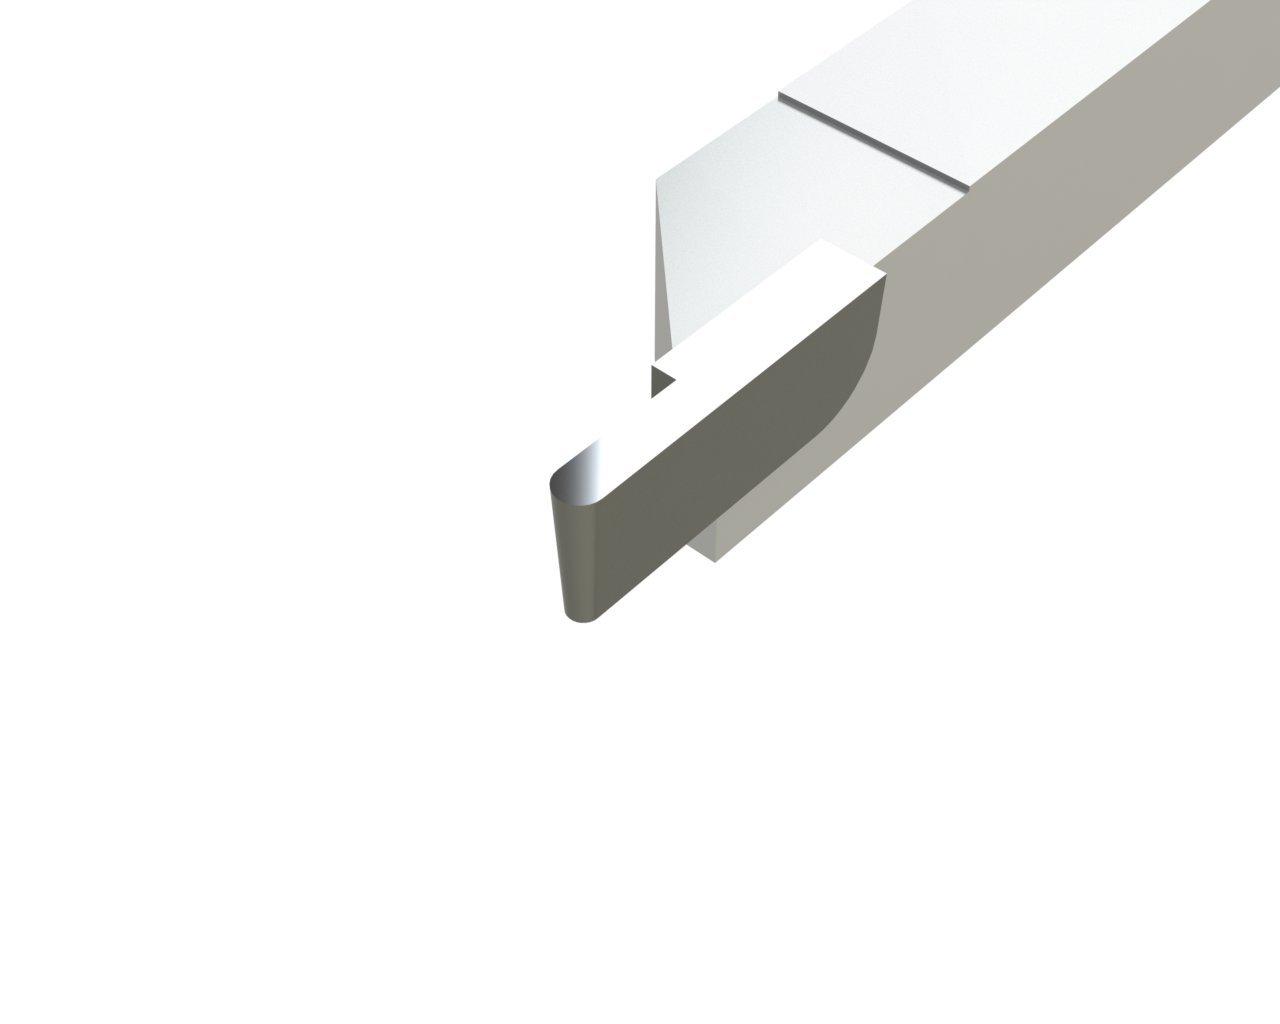 Micro 100 GS-012F Brazed Groove Tool Square Shank DiameterStyle GS 3 Length 3//8 Width 3//8 Height 0.012//0.014 Width Full Radius 0.030 Length